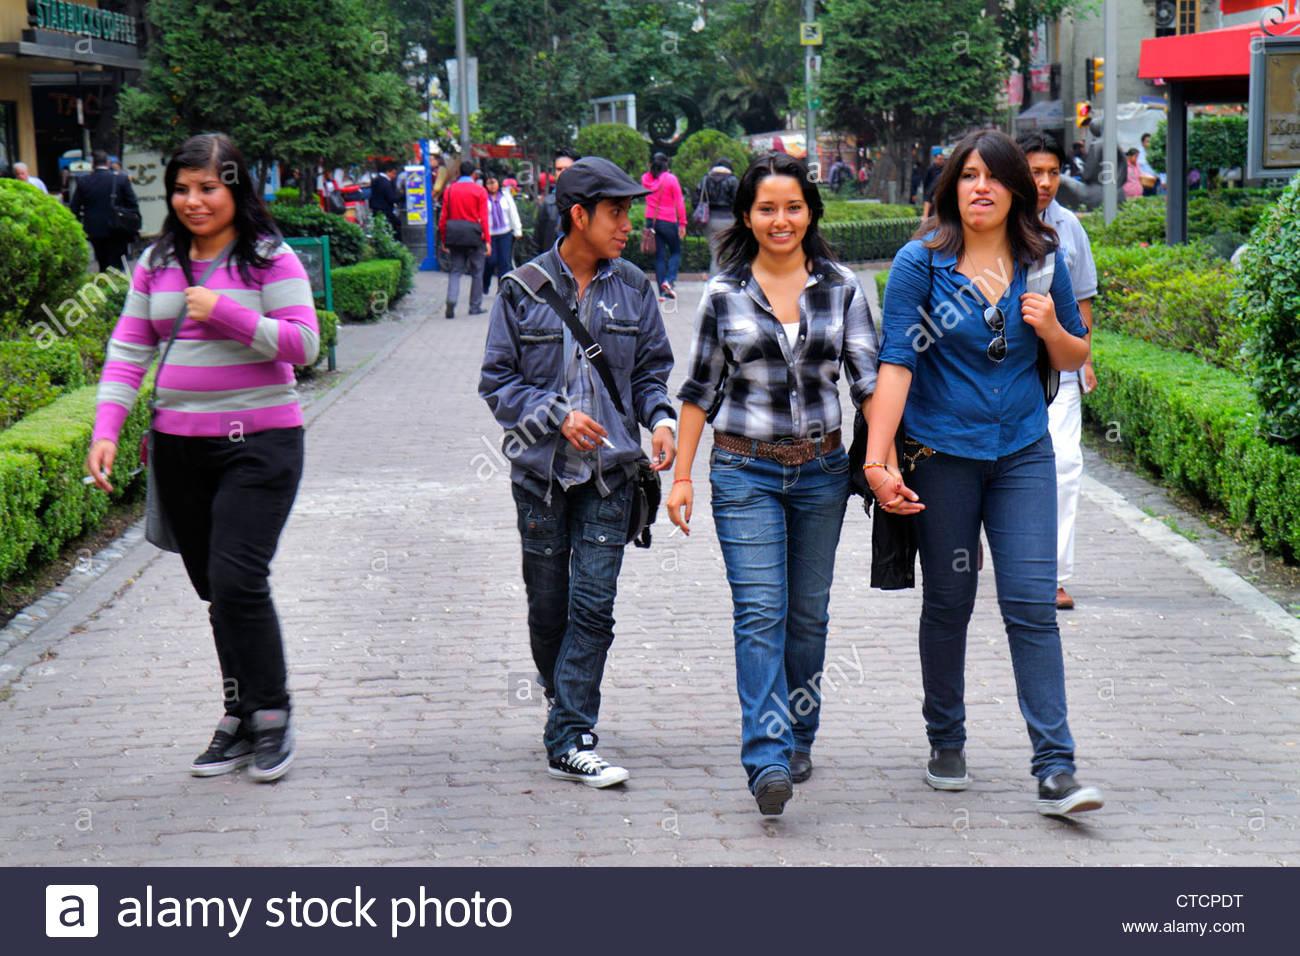 Mexico City Mexico DF D.F. Ciudad de México Federal District Distrito Federal Zona Rosa Calle Genova - Stock Image